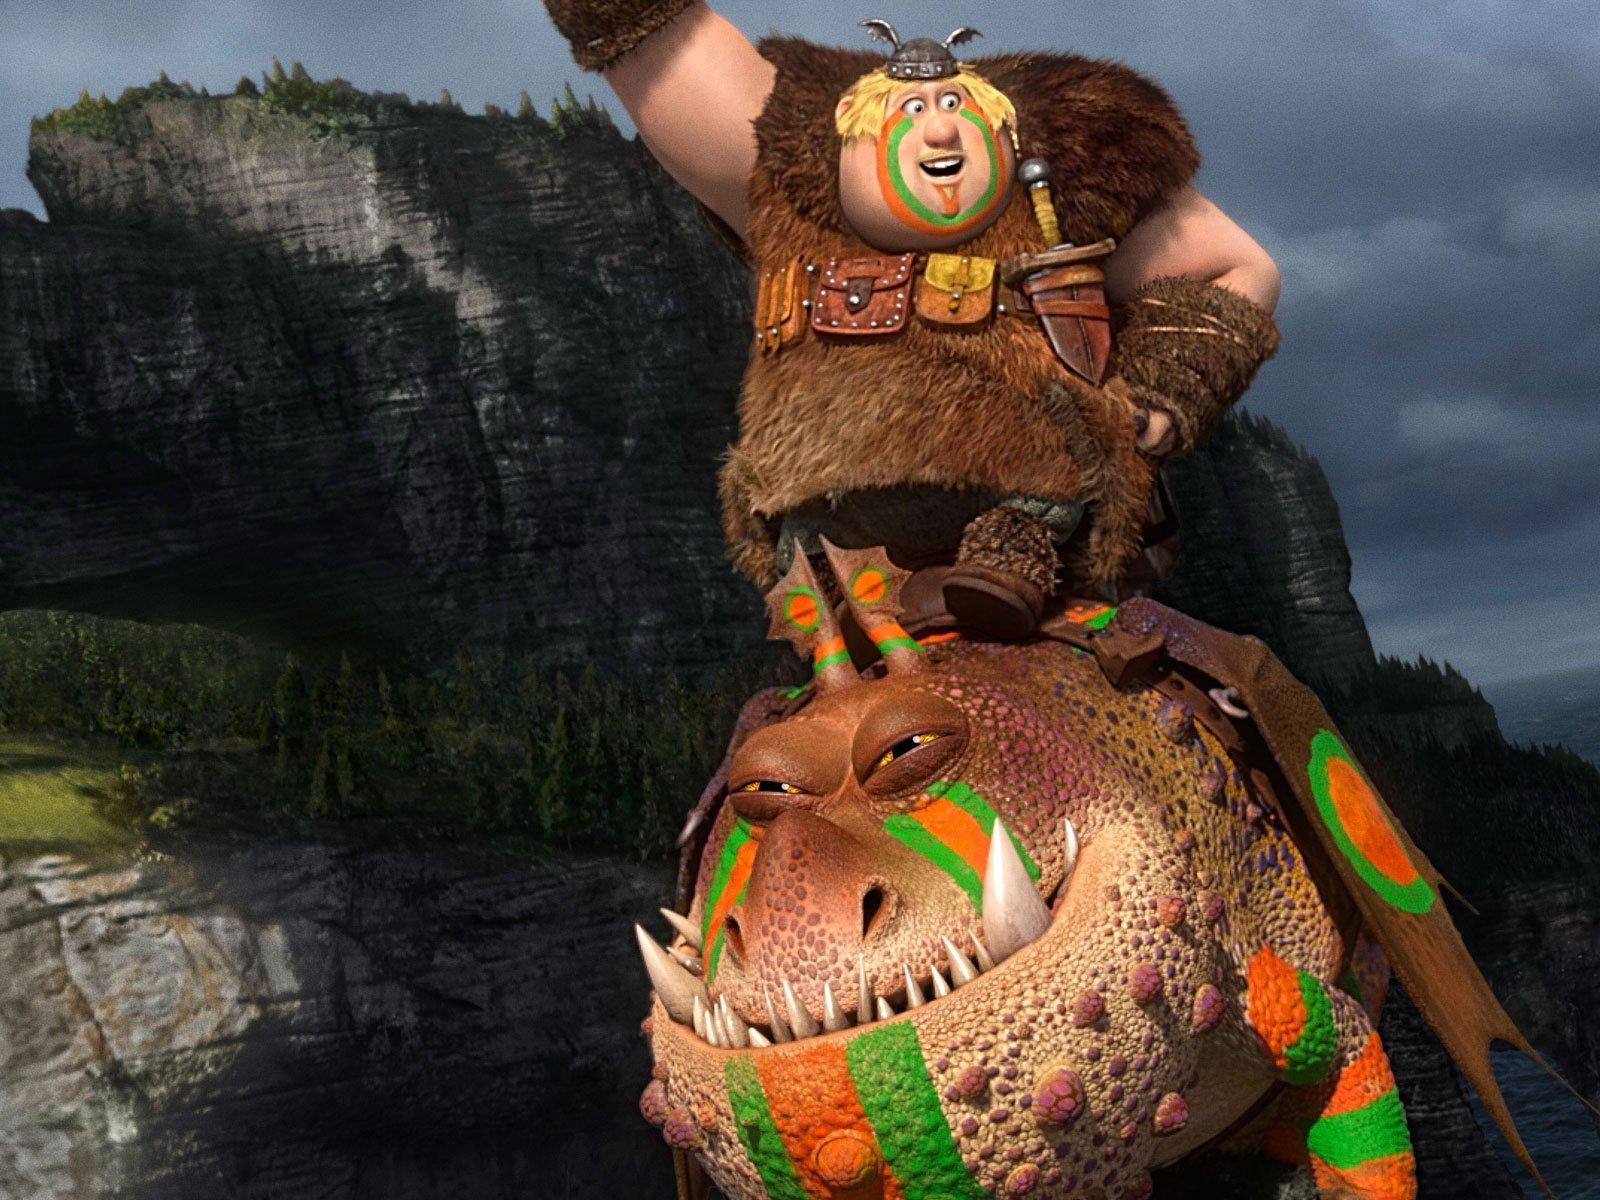 Fishlegs & Meatlug Wallpaper Hd How To Train Your Dragon 2 Meatlug Power  Dragon Spike Blast